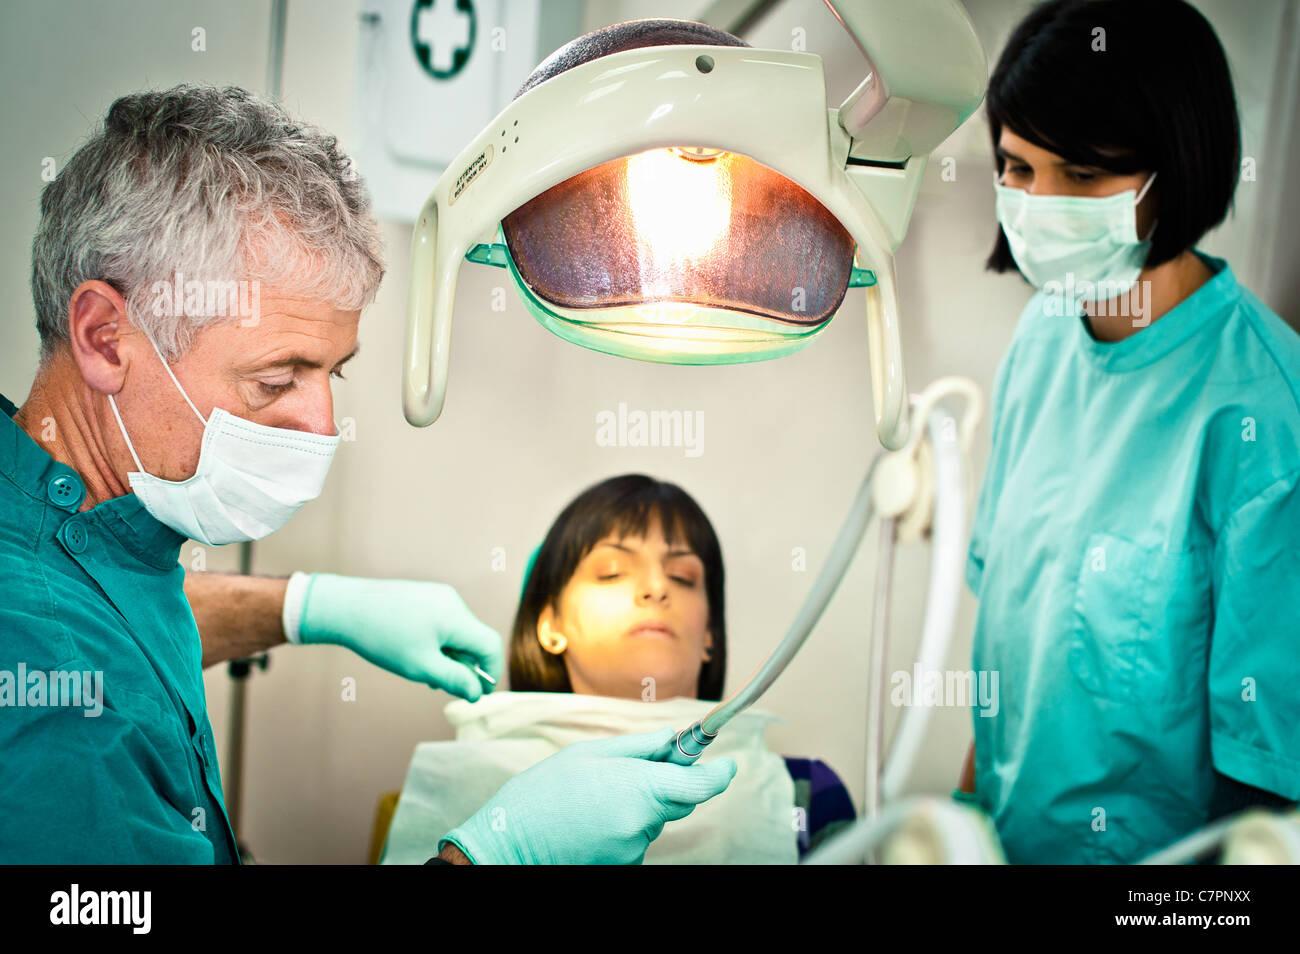 Dentiste et sous-working in office Photo Stock